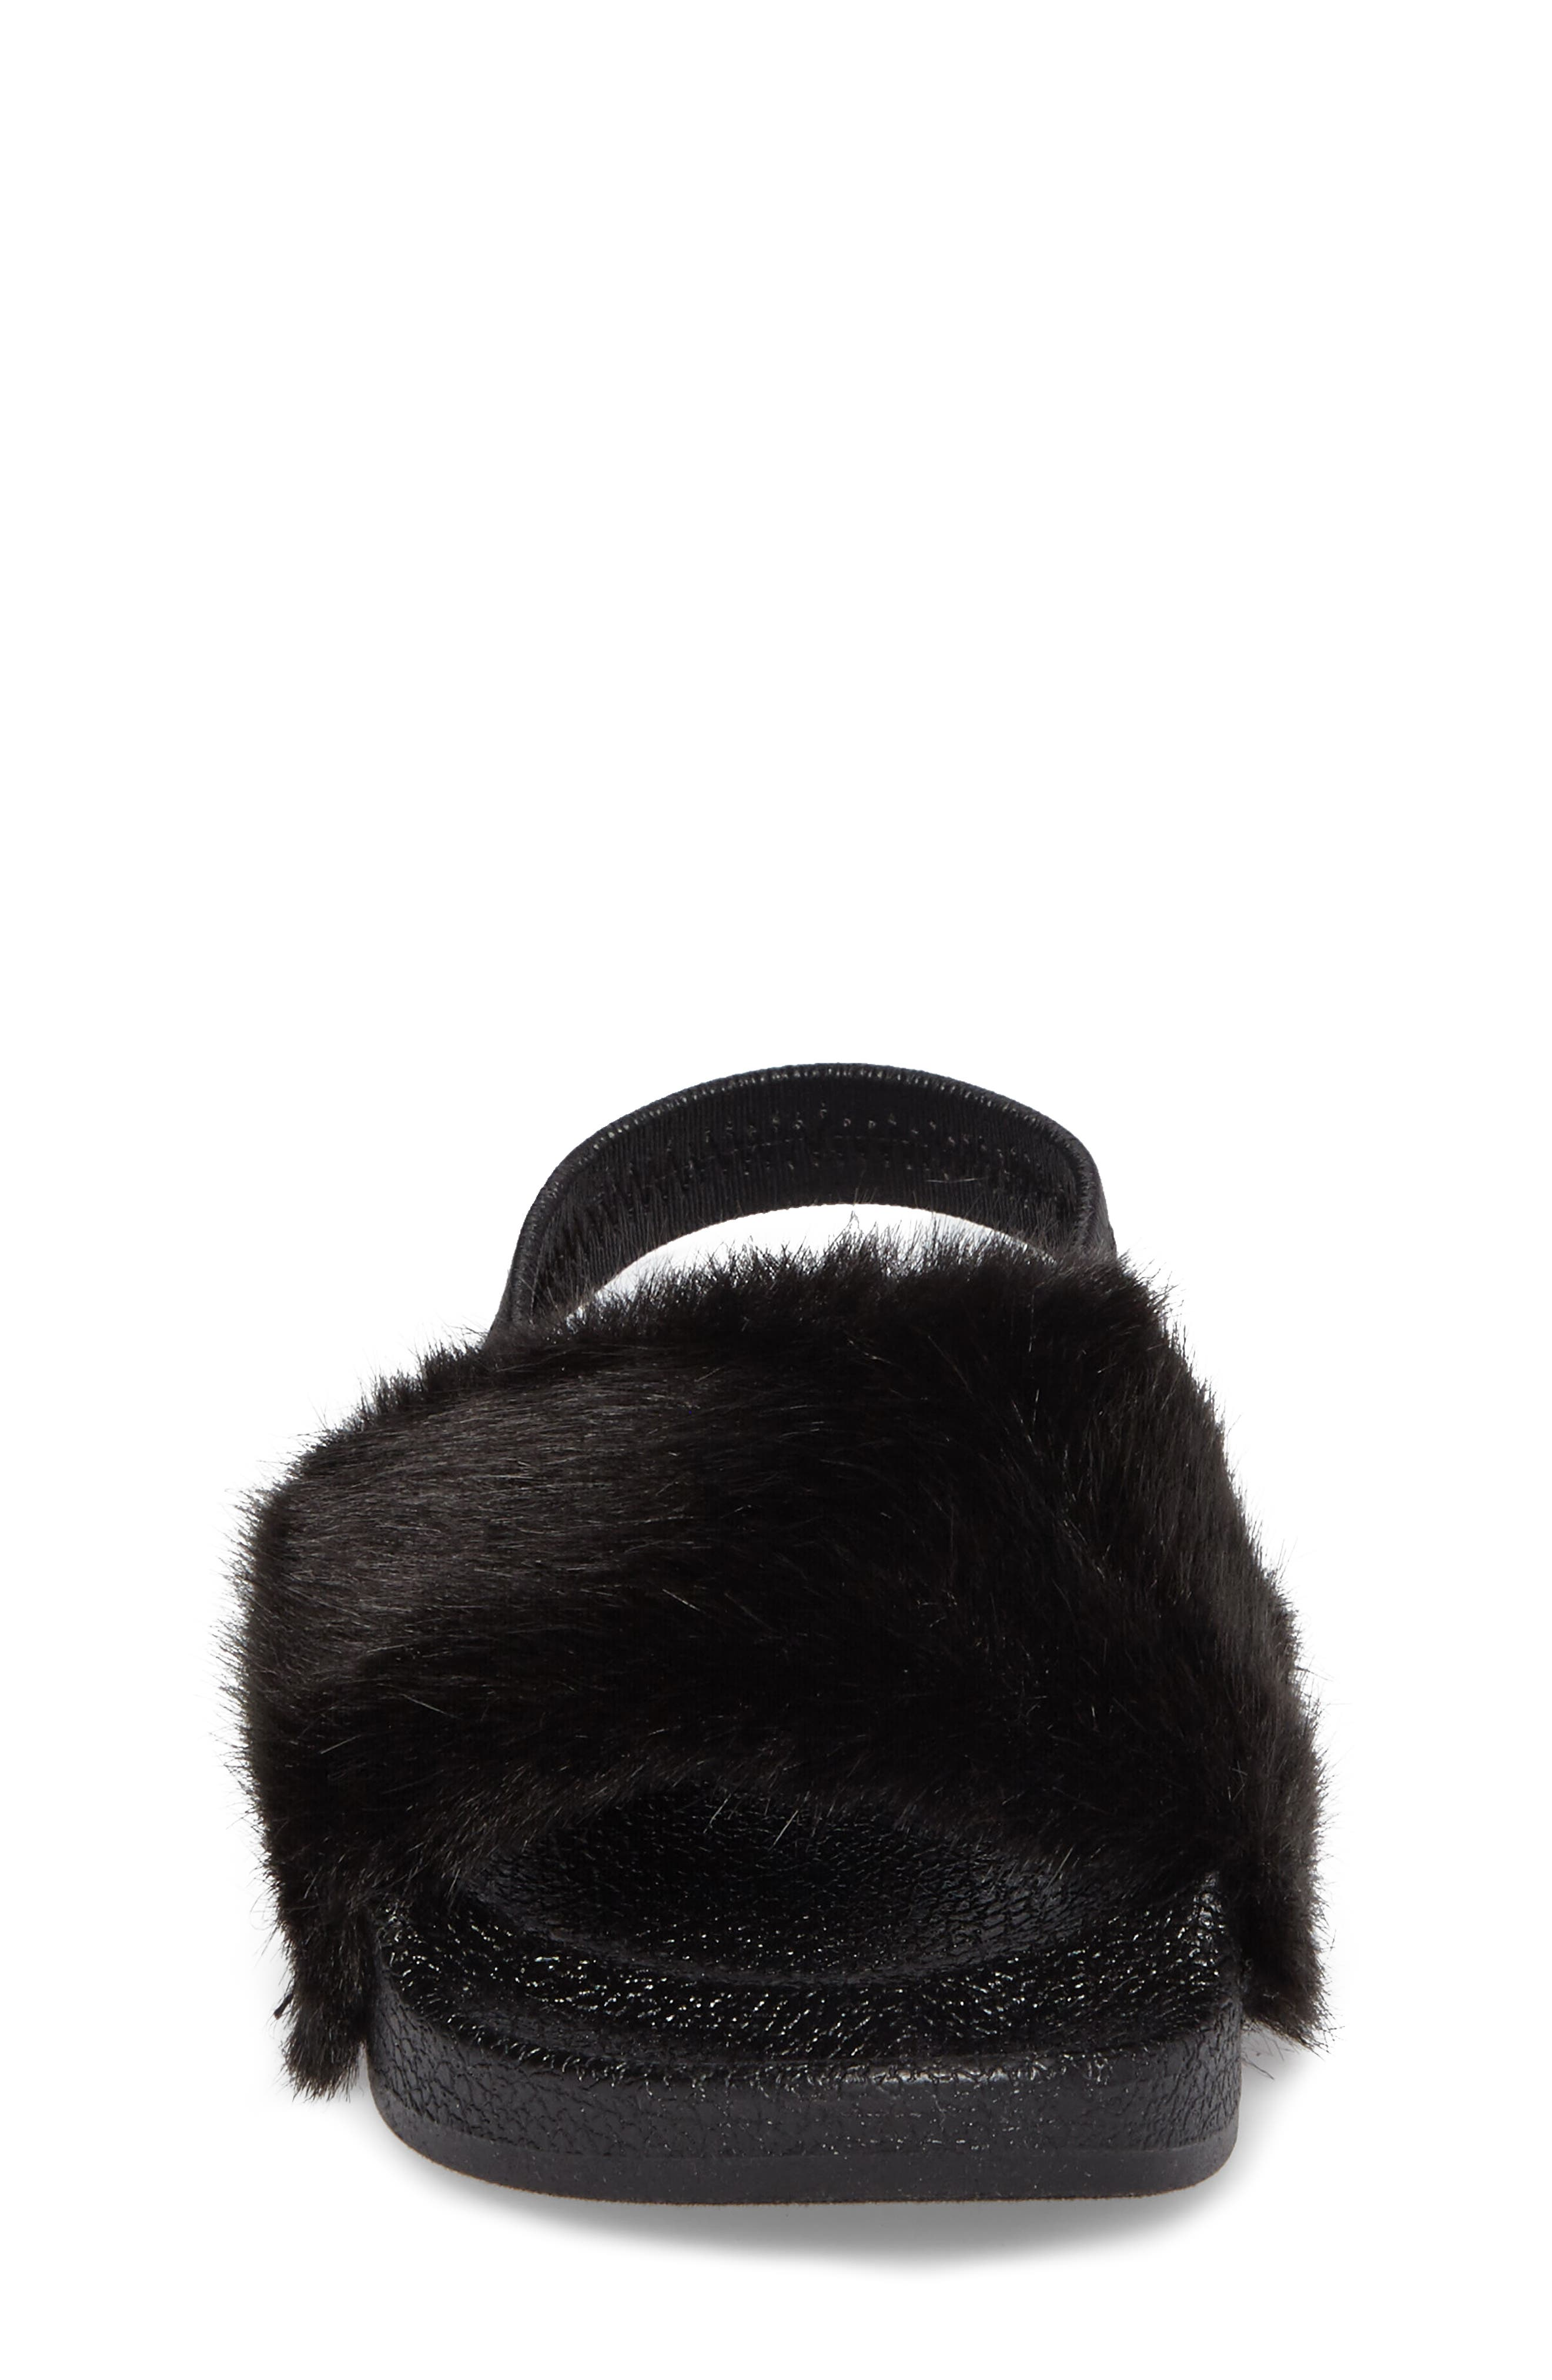 Tsoftey Faux Fur Slide Sandal,                             Alternate thumbnail 4, color,                             006